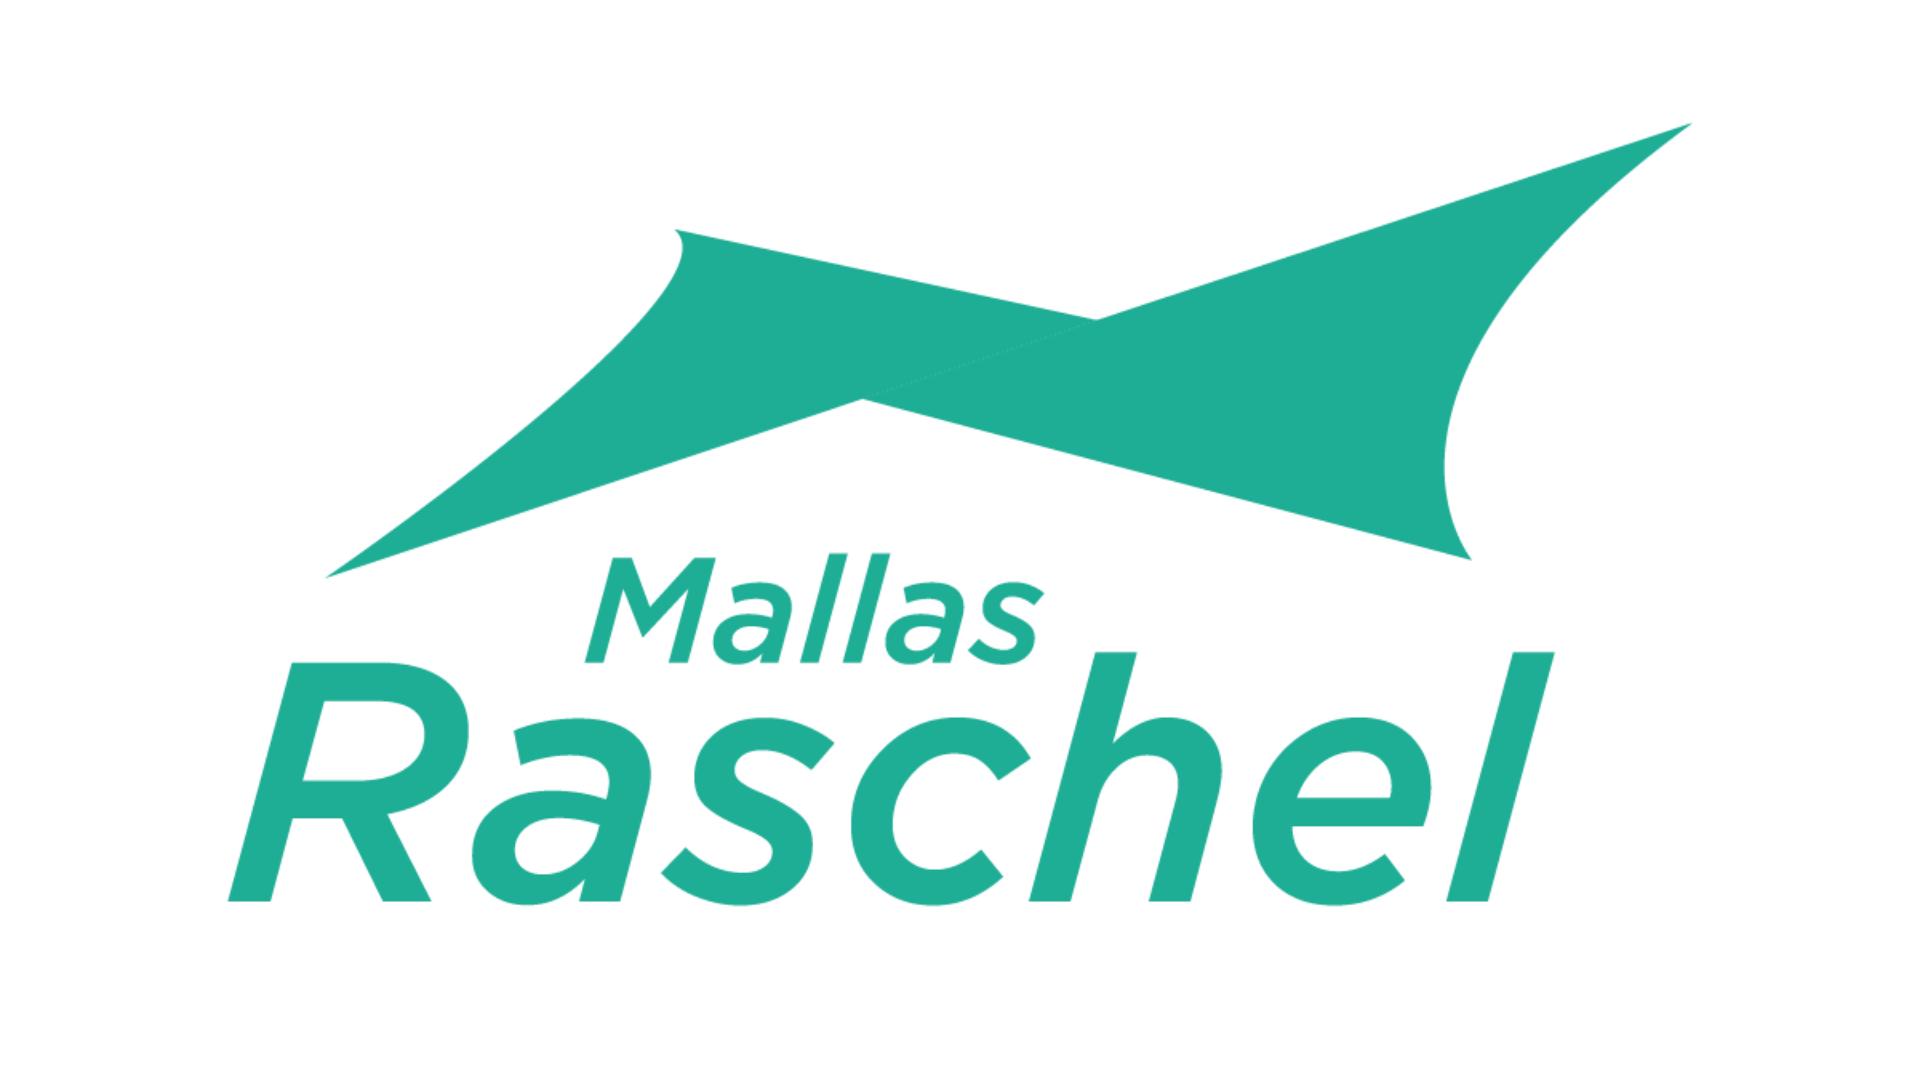 Mallas Raschel